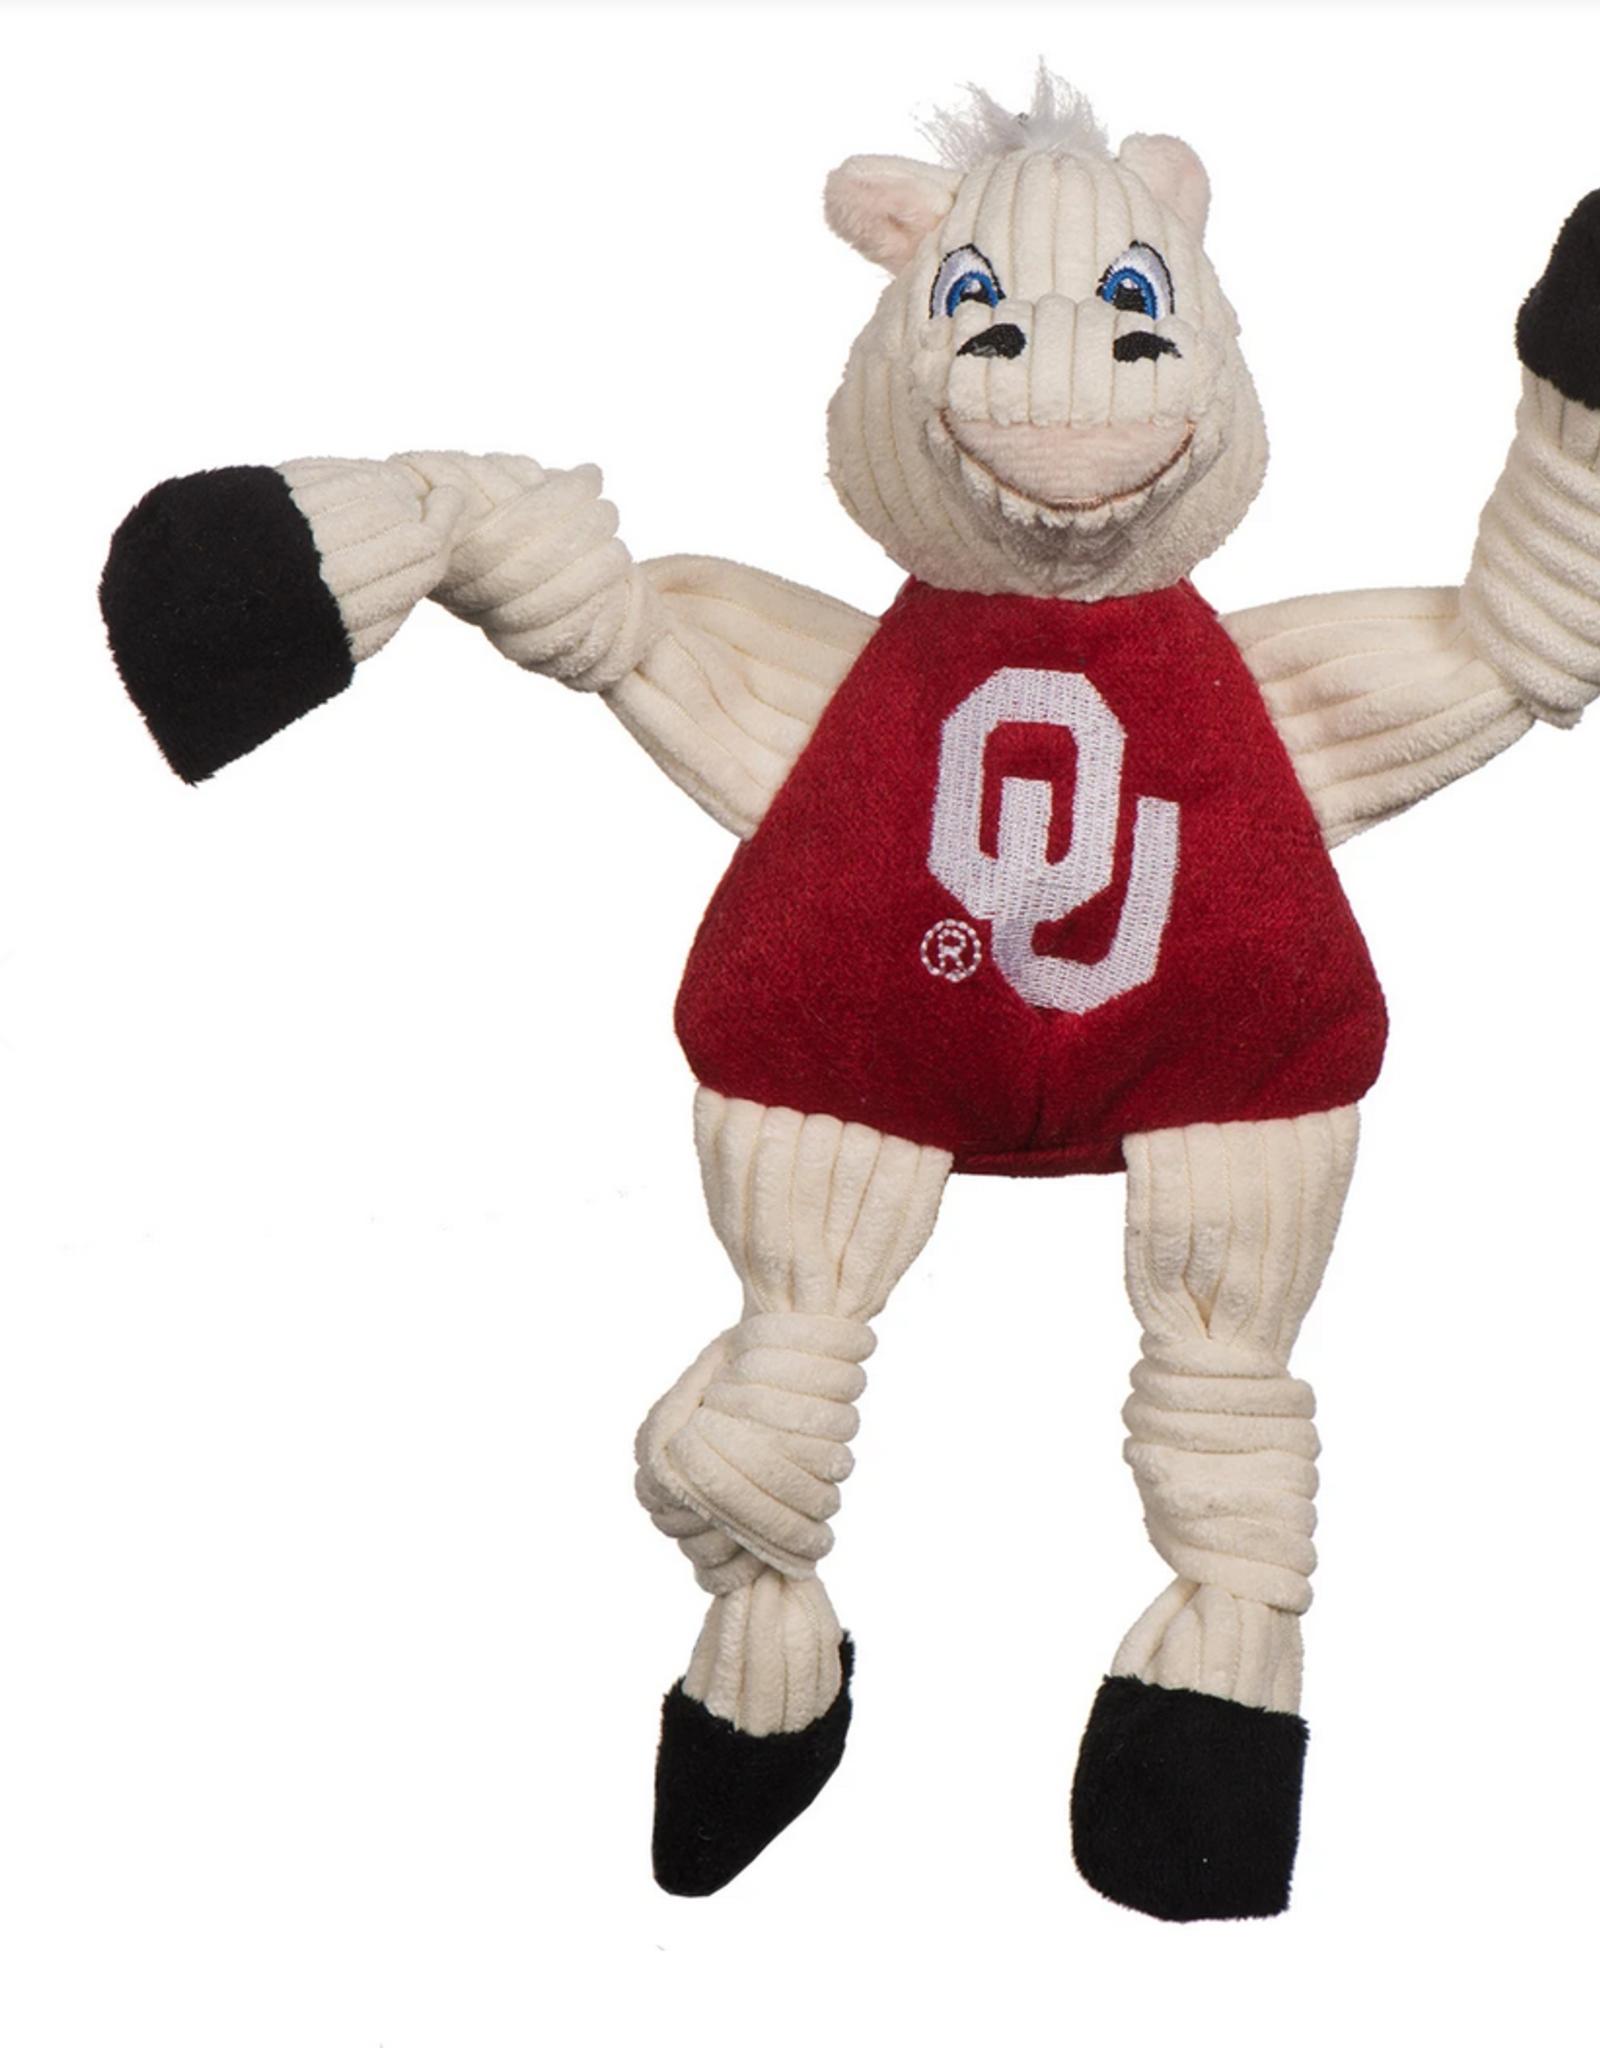 "Huggle Hounds OU Knottie Huggle Hounds Dog Toy Large (15"")"